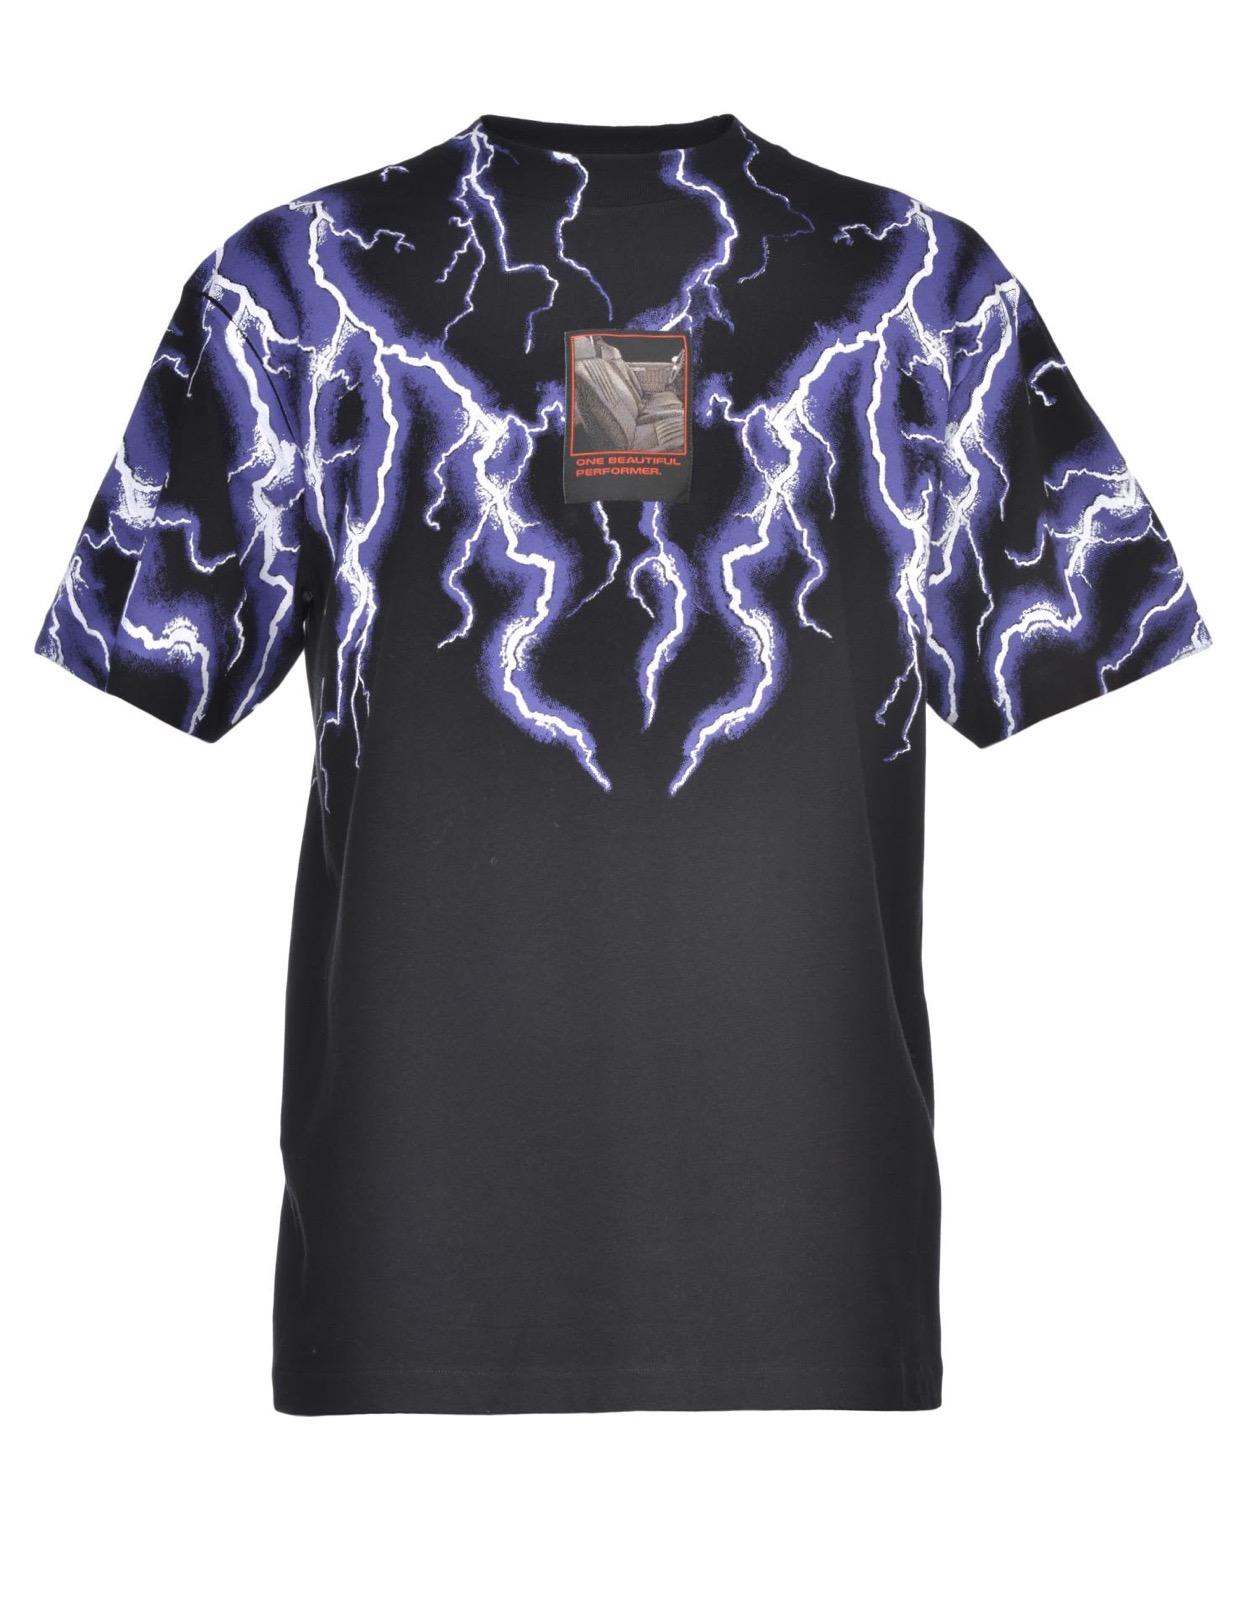 010d28bef Alexander Wang ×. Lightning Collage Short Sleeve Tee Top. Size: US M ...